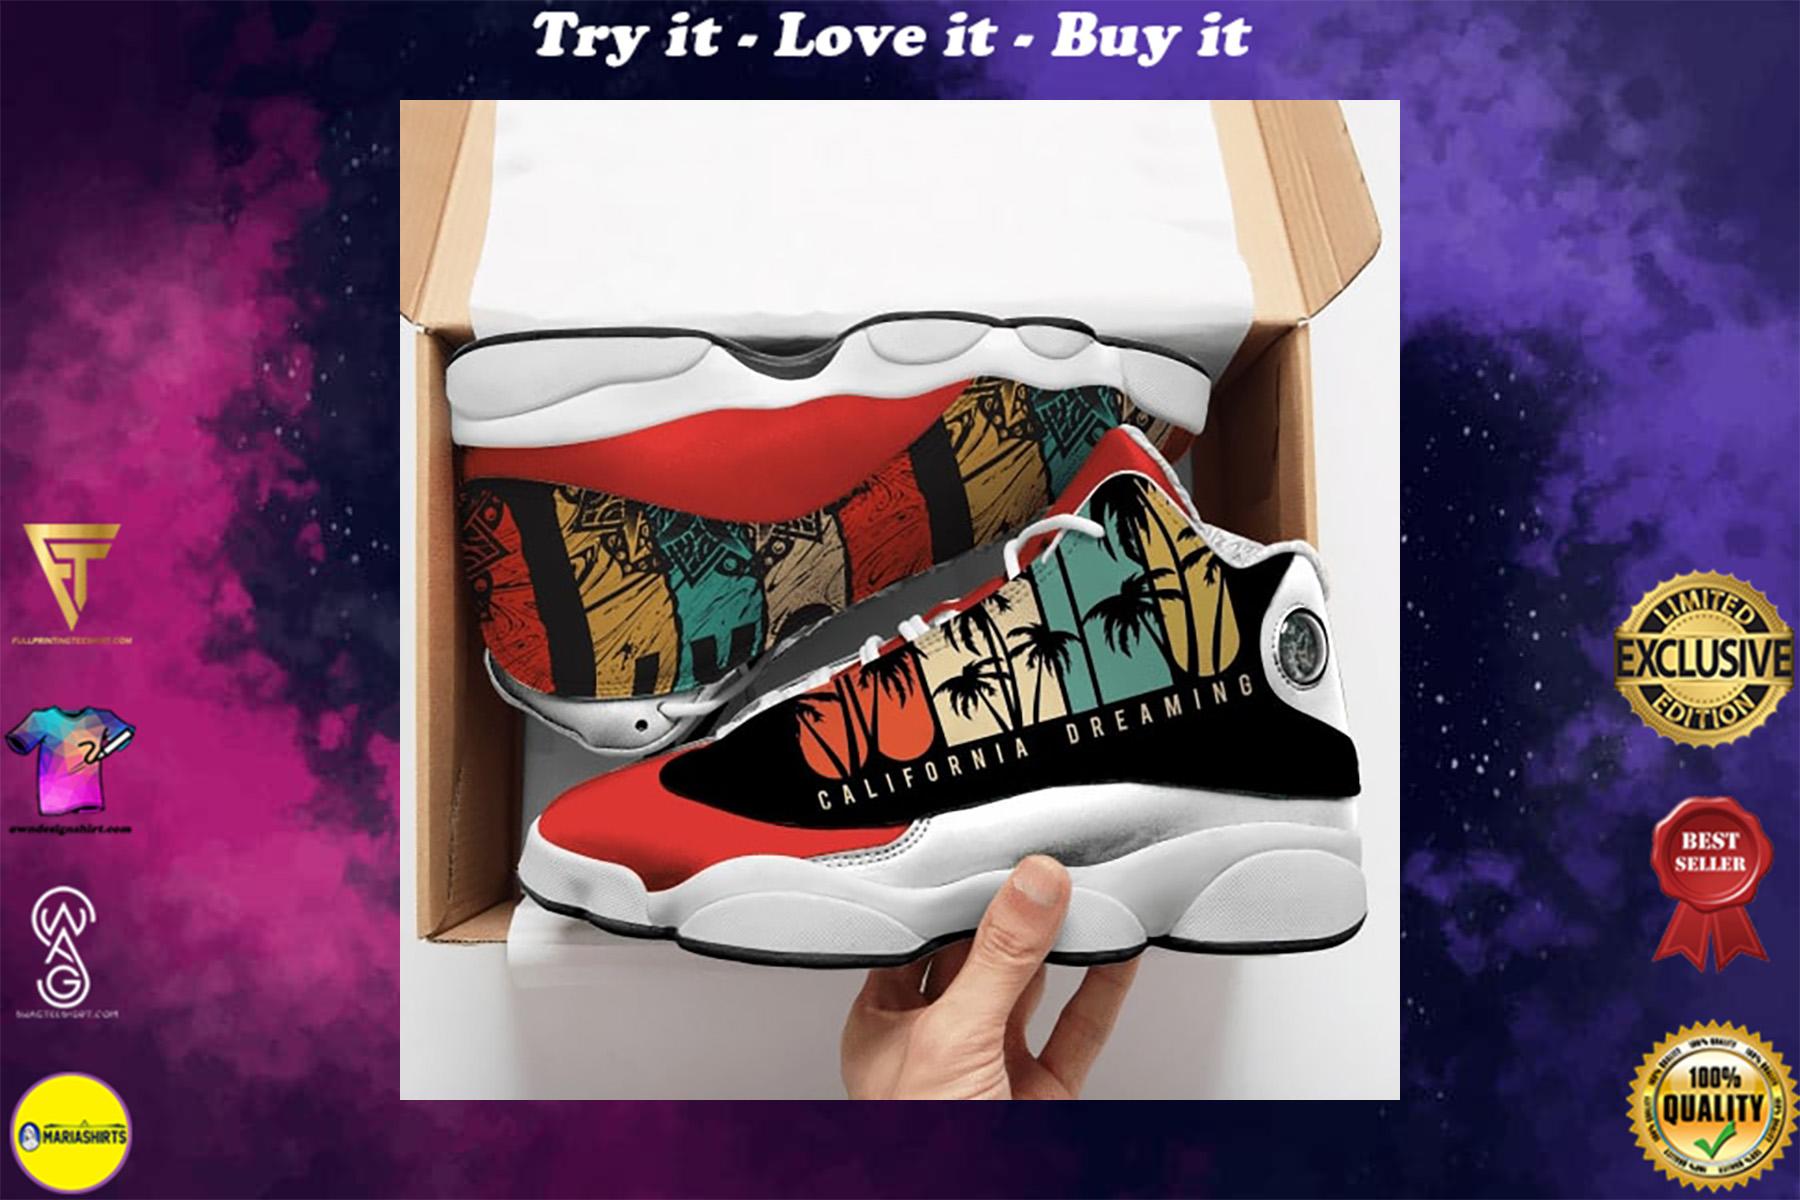 california dreaming vintage all over printed air jordan 13 sneakers